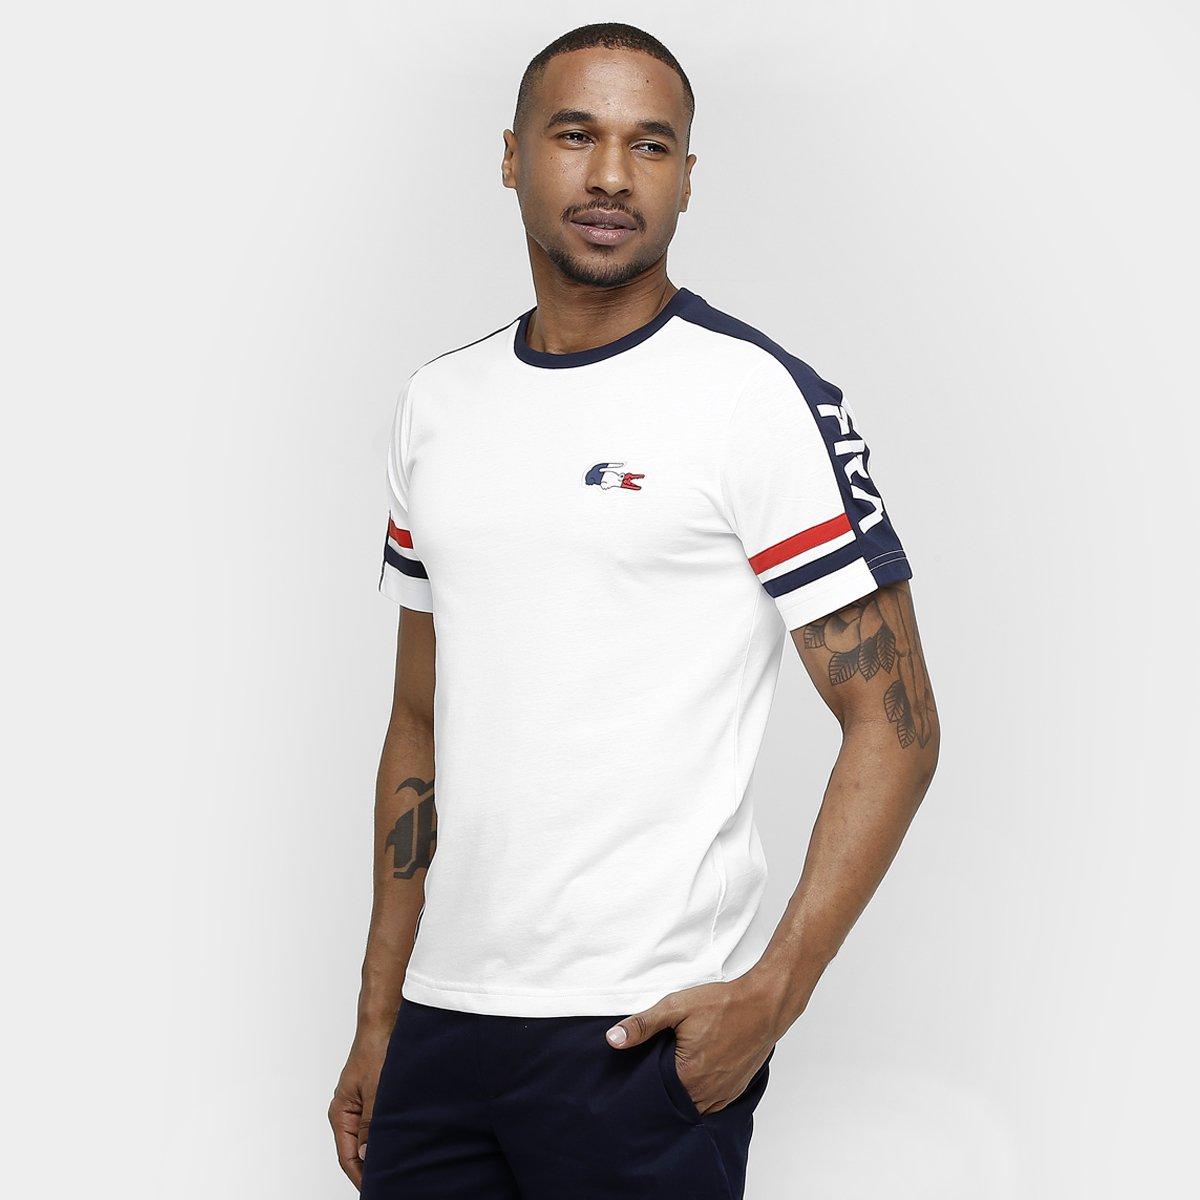 Camiseta Lacoste Franca - Compre Agora   Netshoes 93cb7ac208